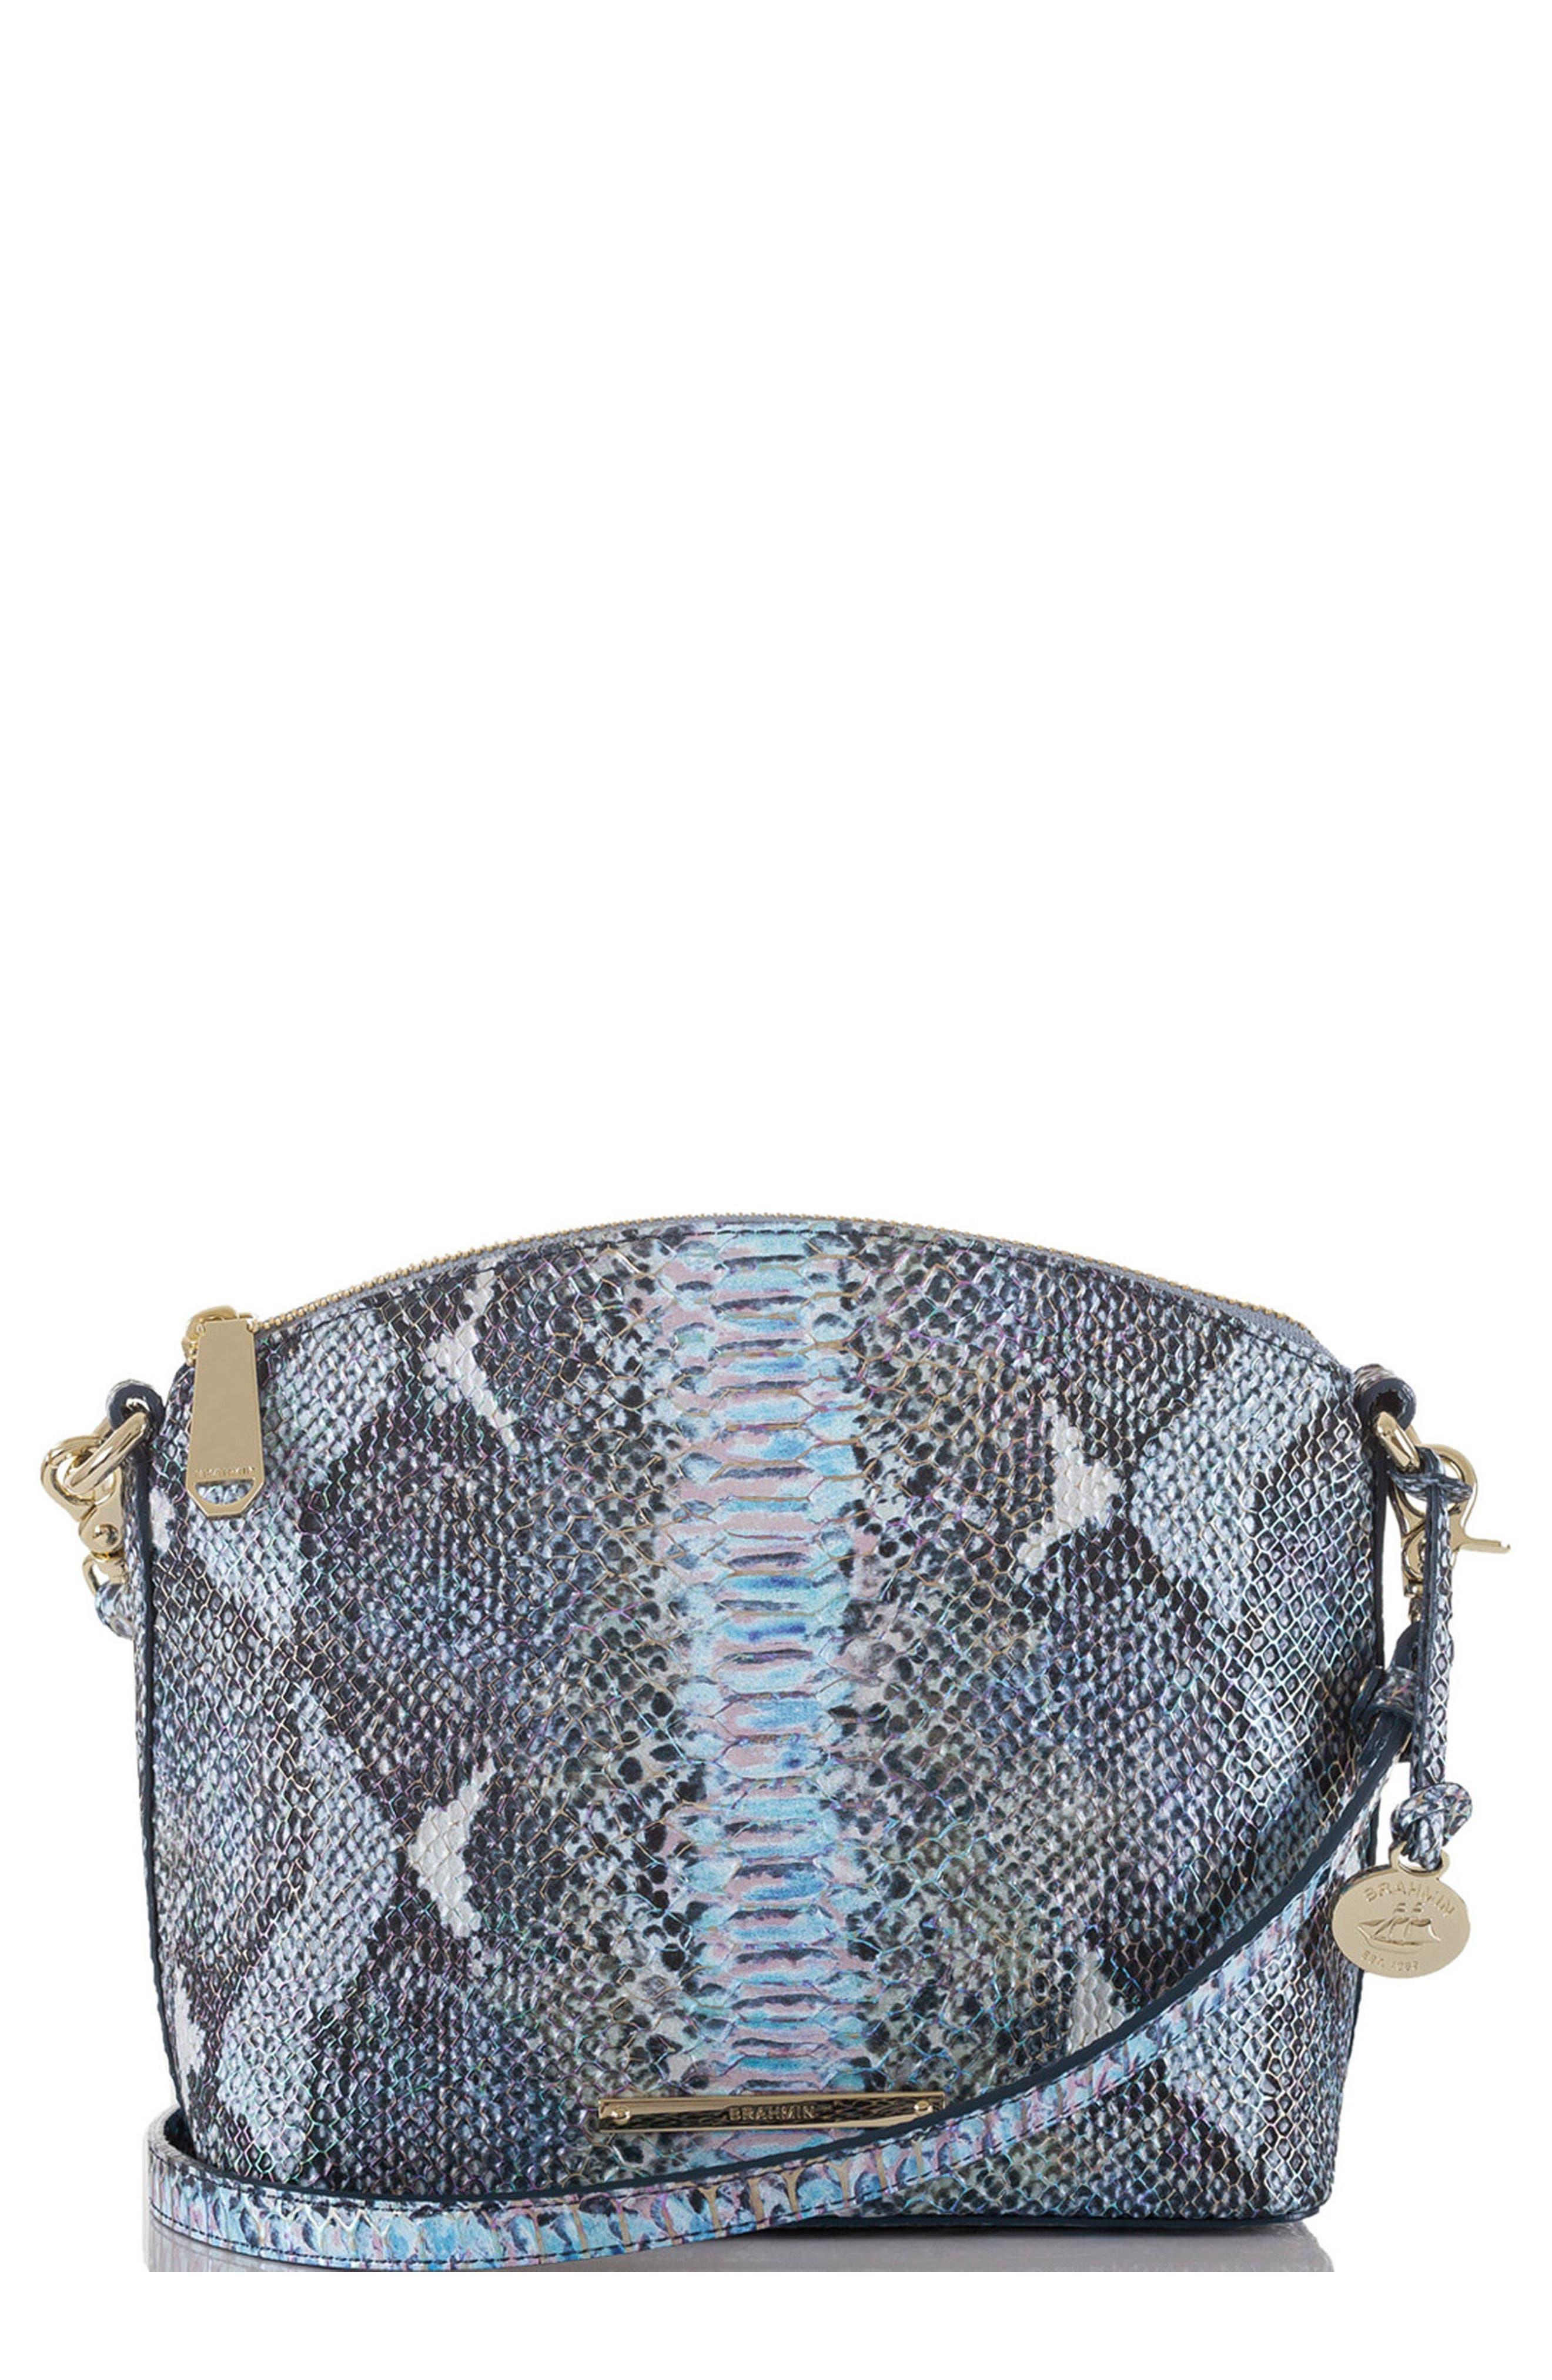 'Mini Duxbury' Crossbody Bag,                             Main thumbnail 1, color,                             Marine Seville